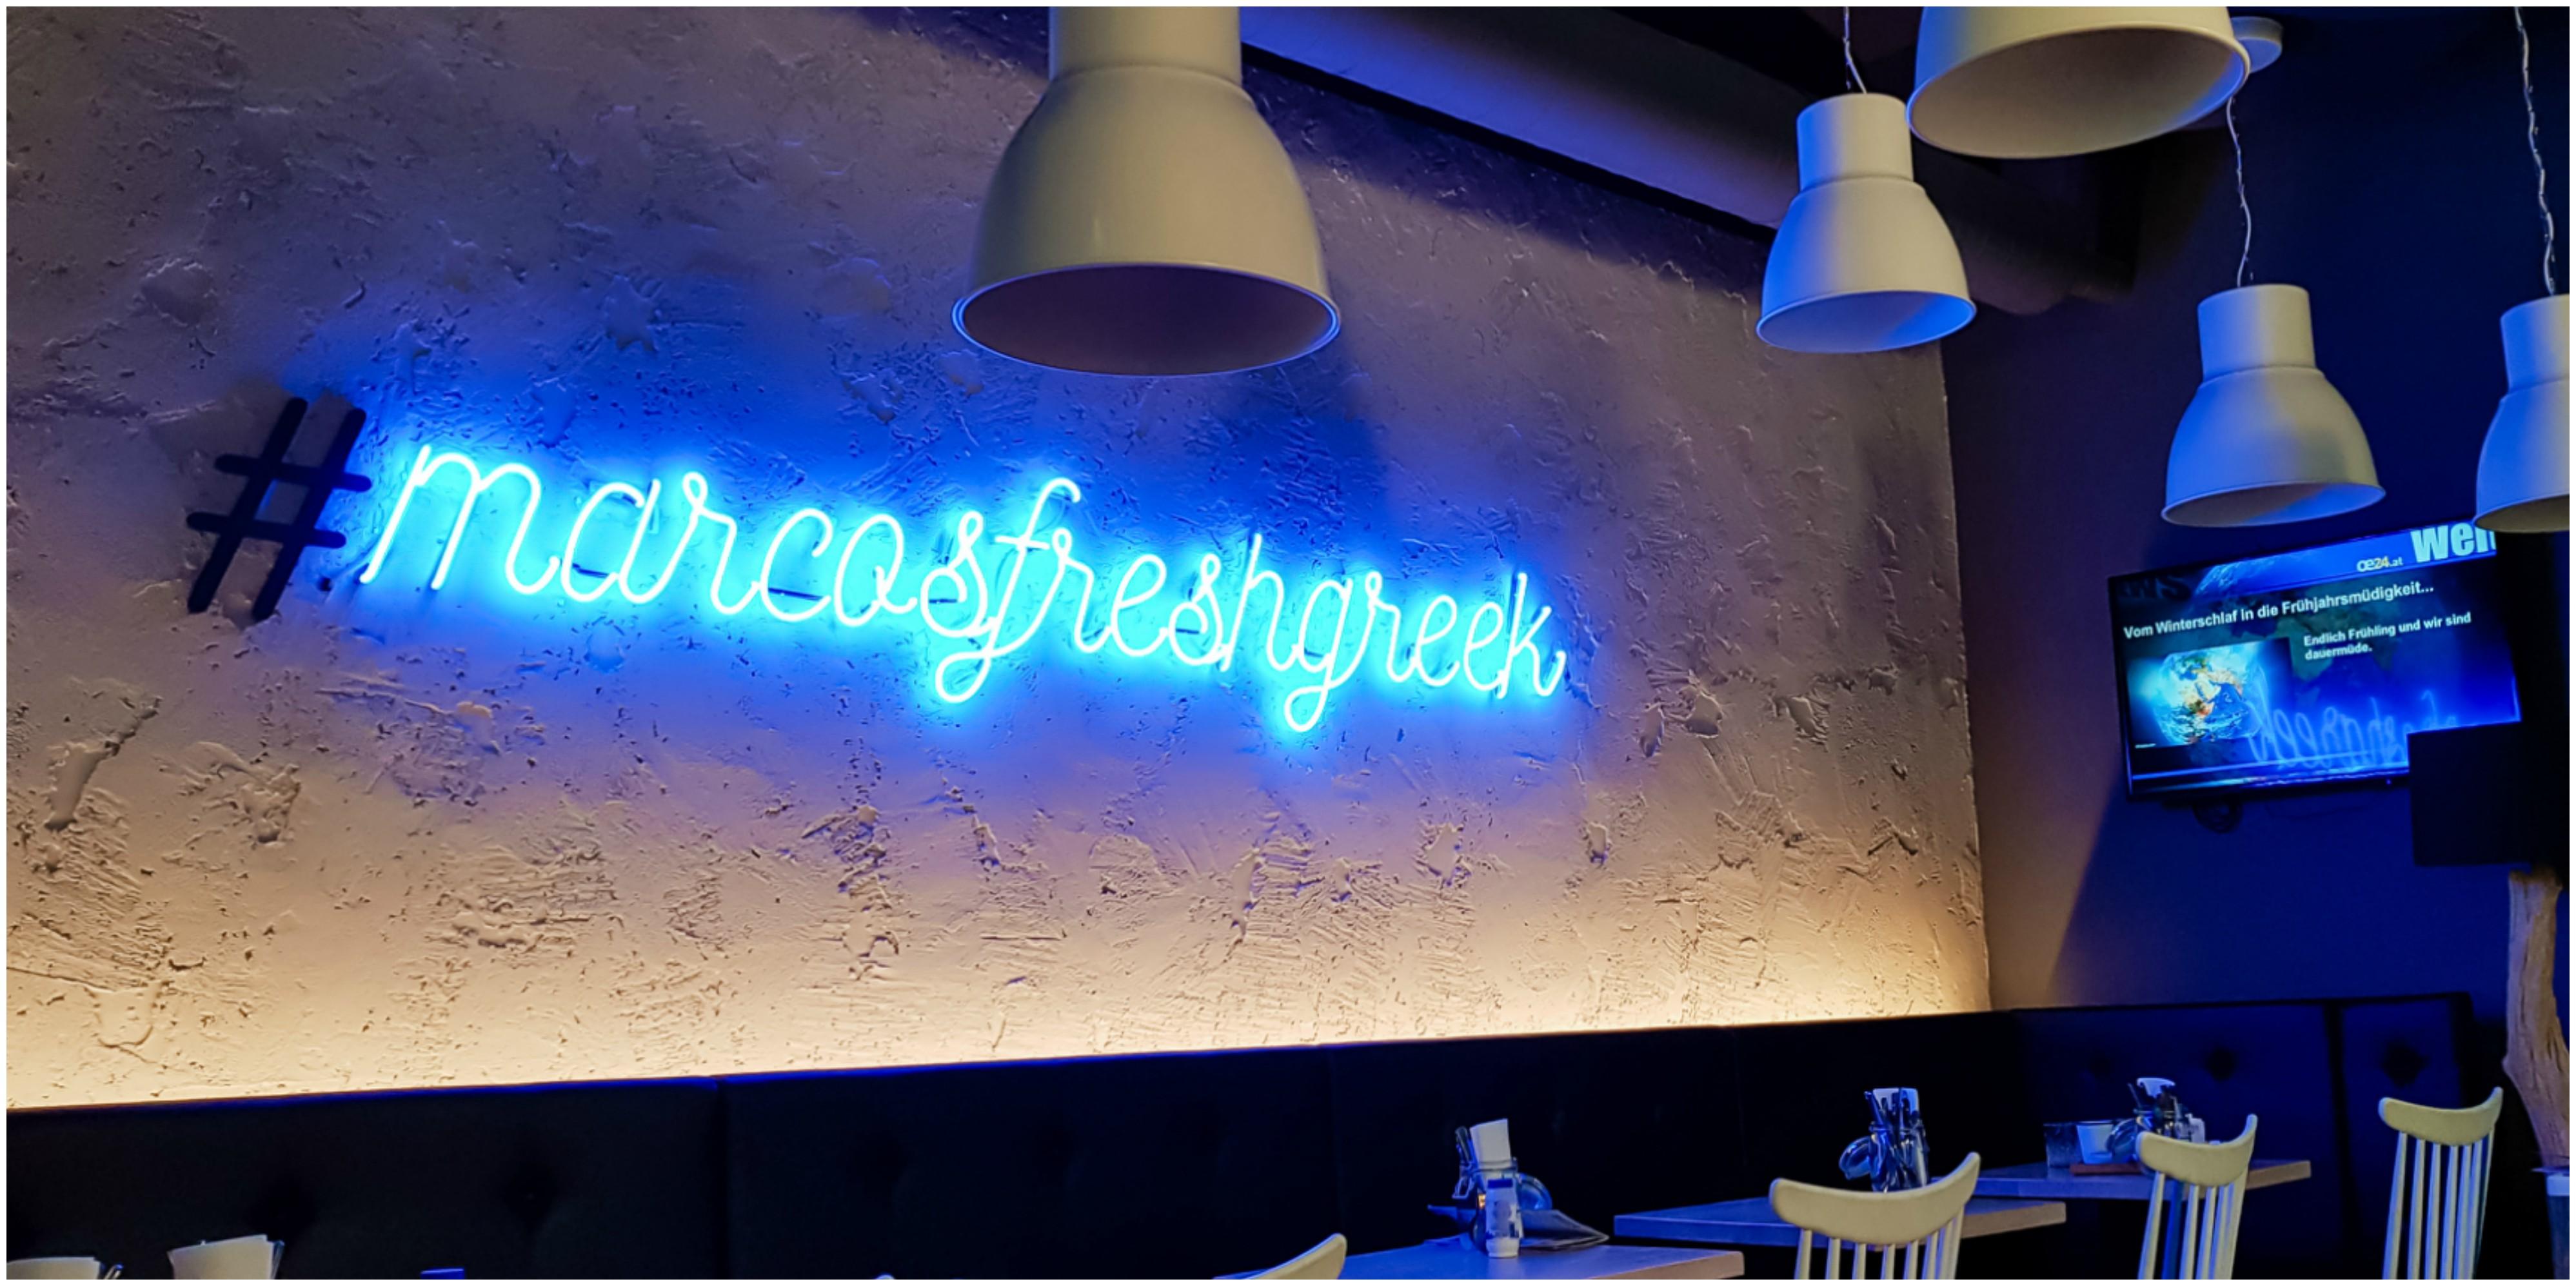 marcos-fresh-greek-wien-austria-vegan-friendly